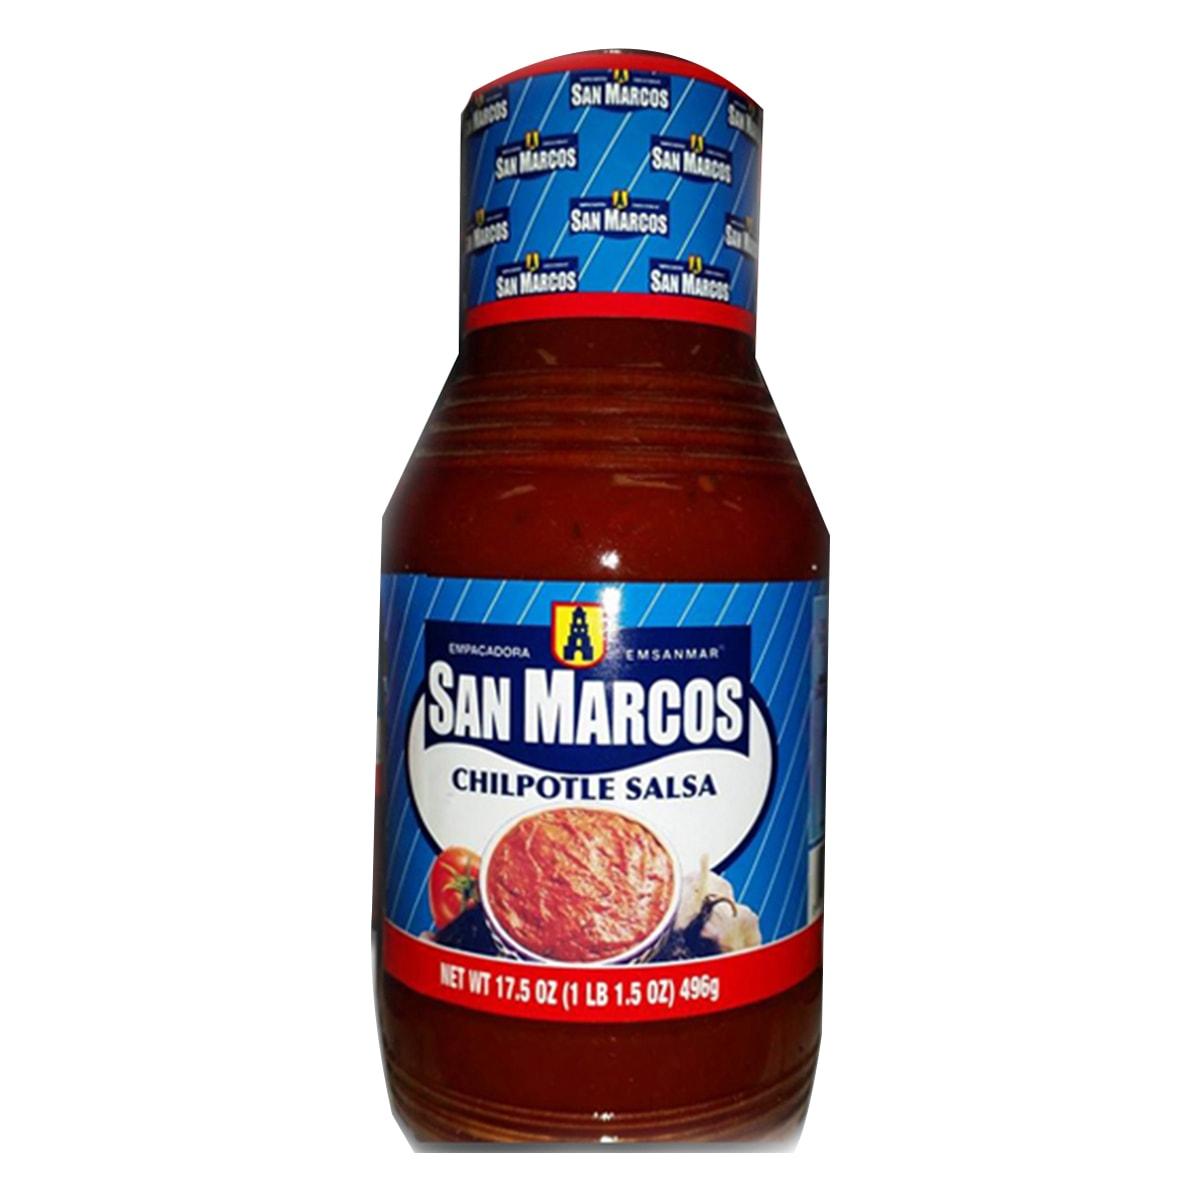 Buy San Marcos Chipotle Salsa - 496 gm